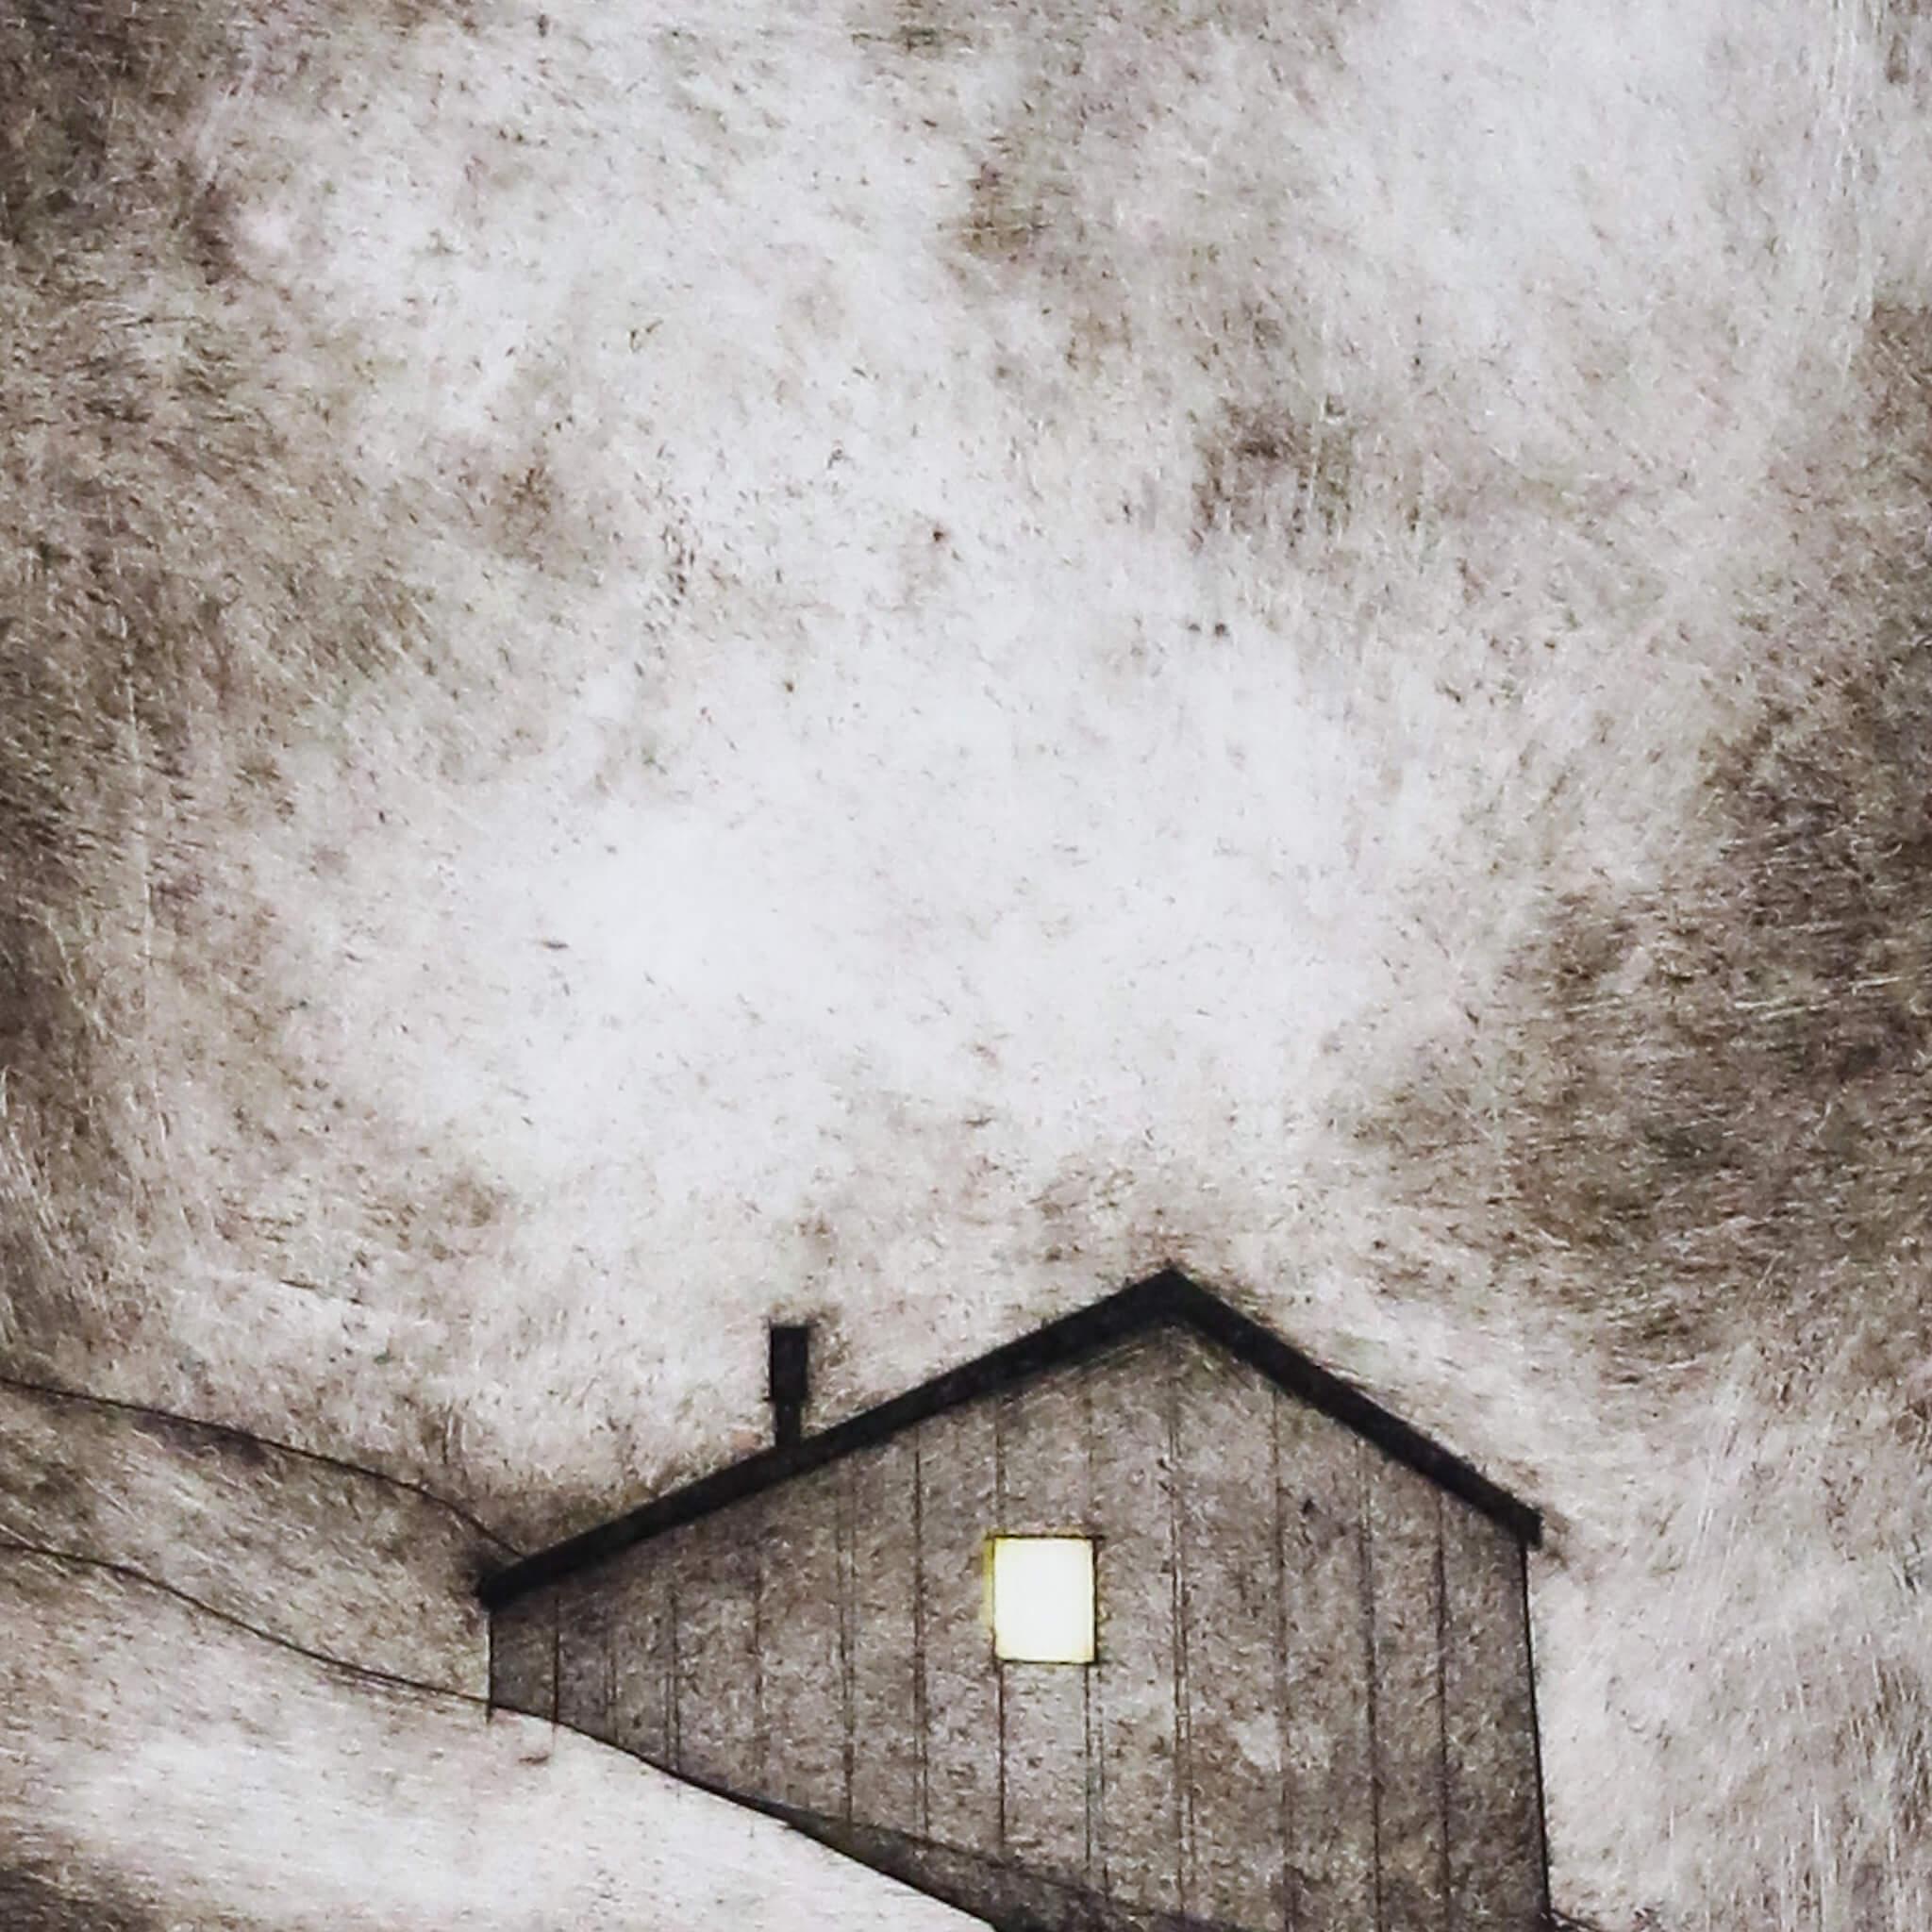 N58A2985 copy - The Mountain Cabin by Sarah Morgan